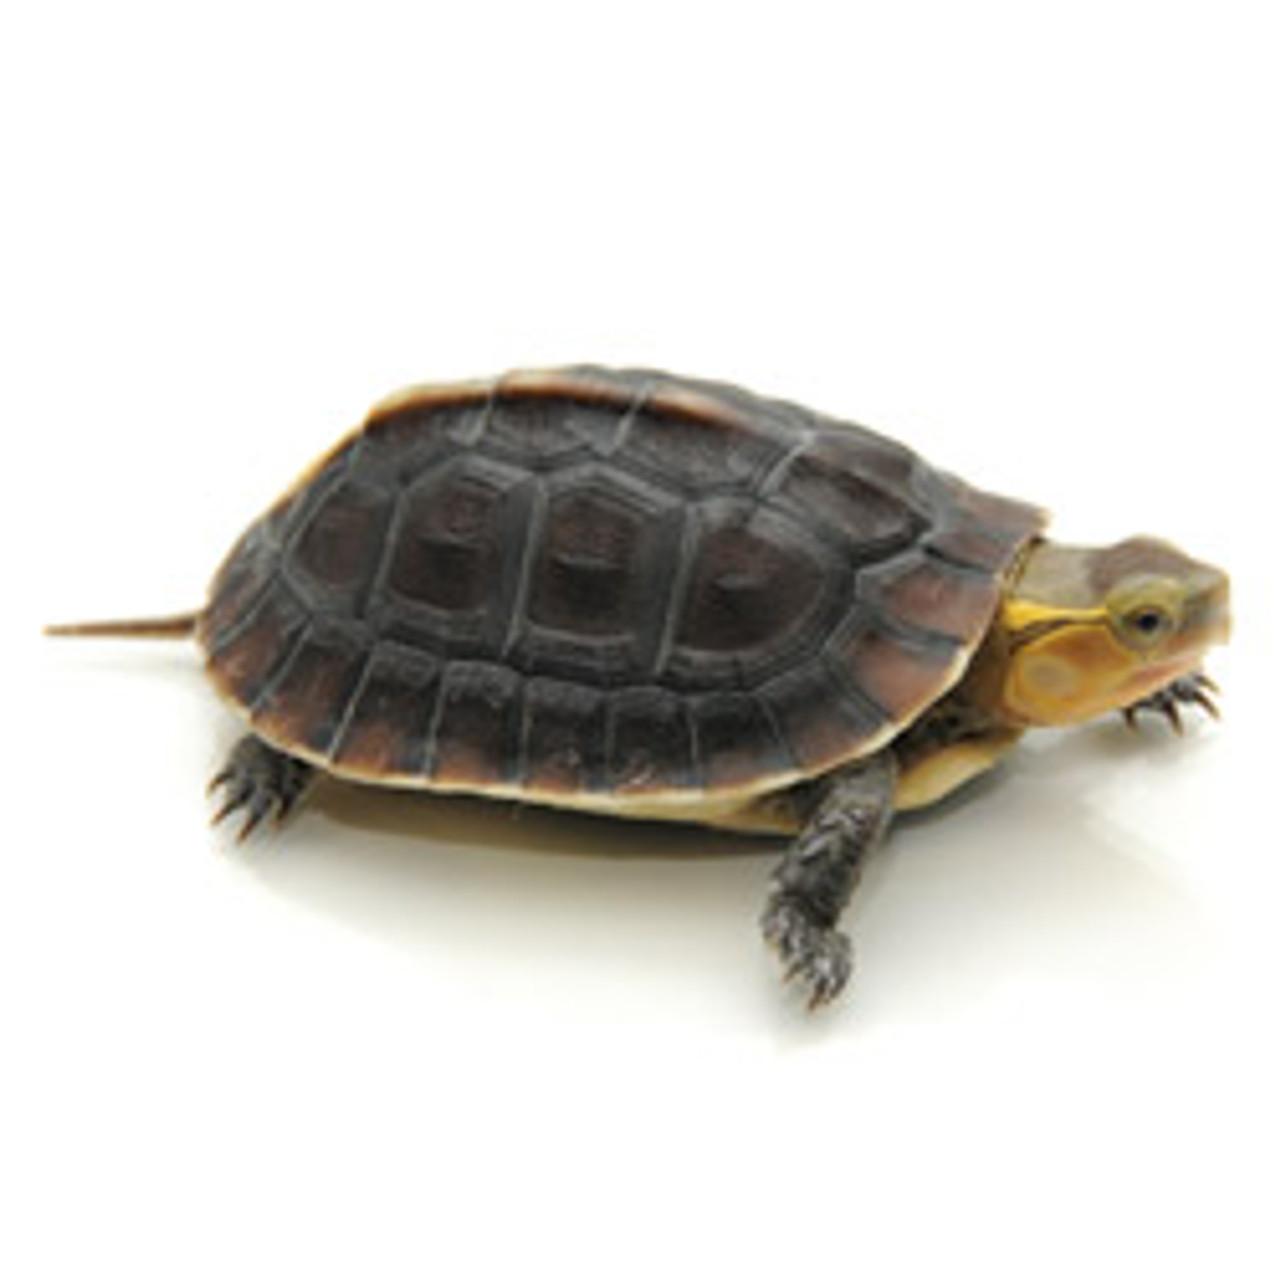 Chinese Box Turtle (Coura flavomarginata)